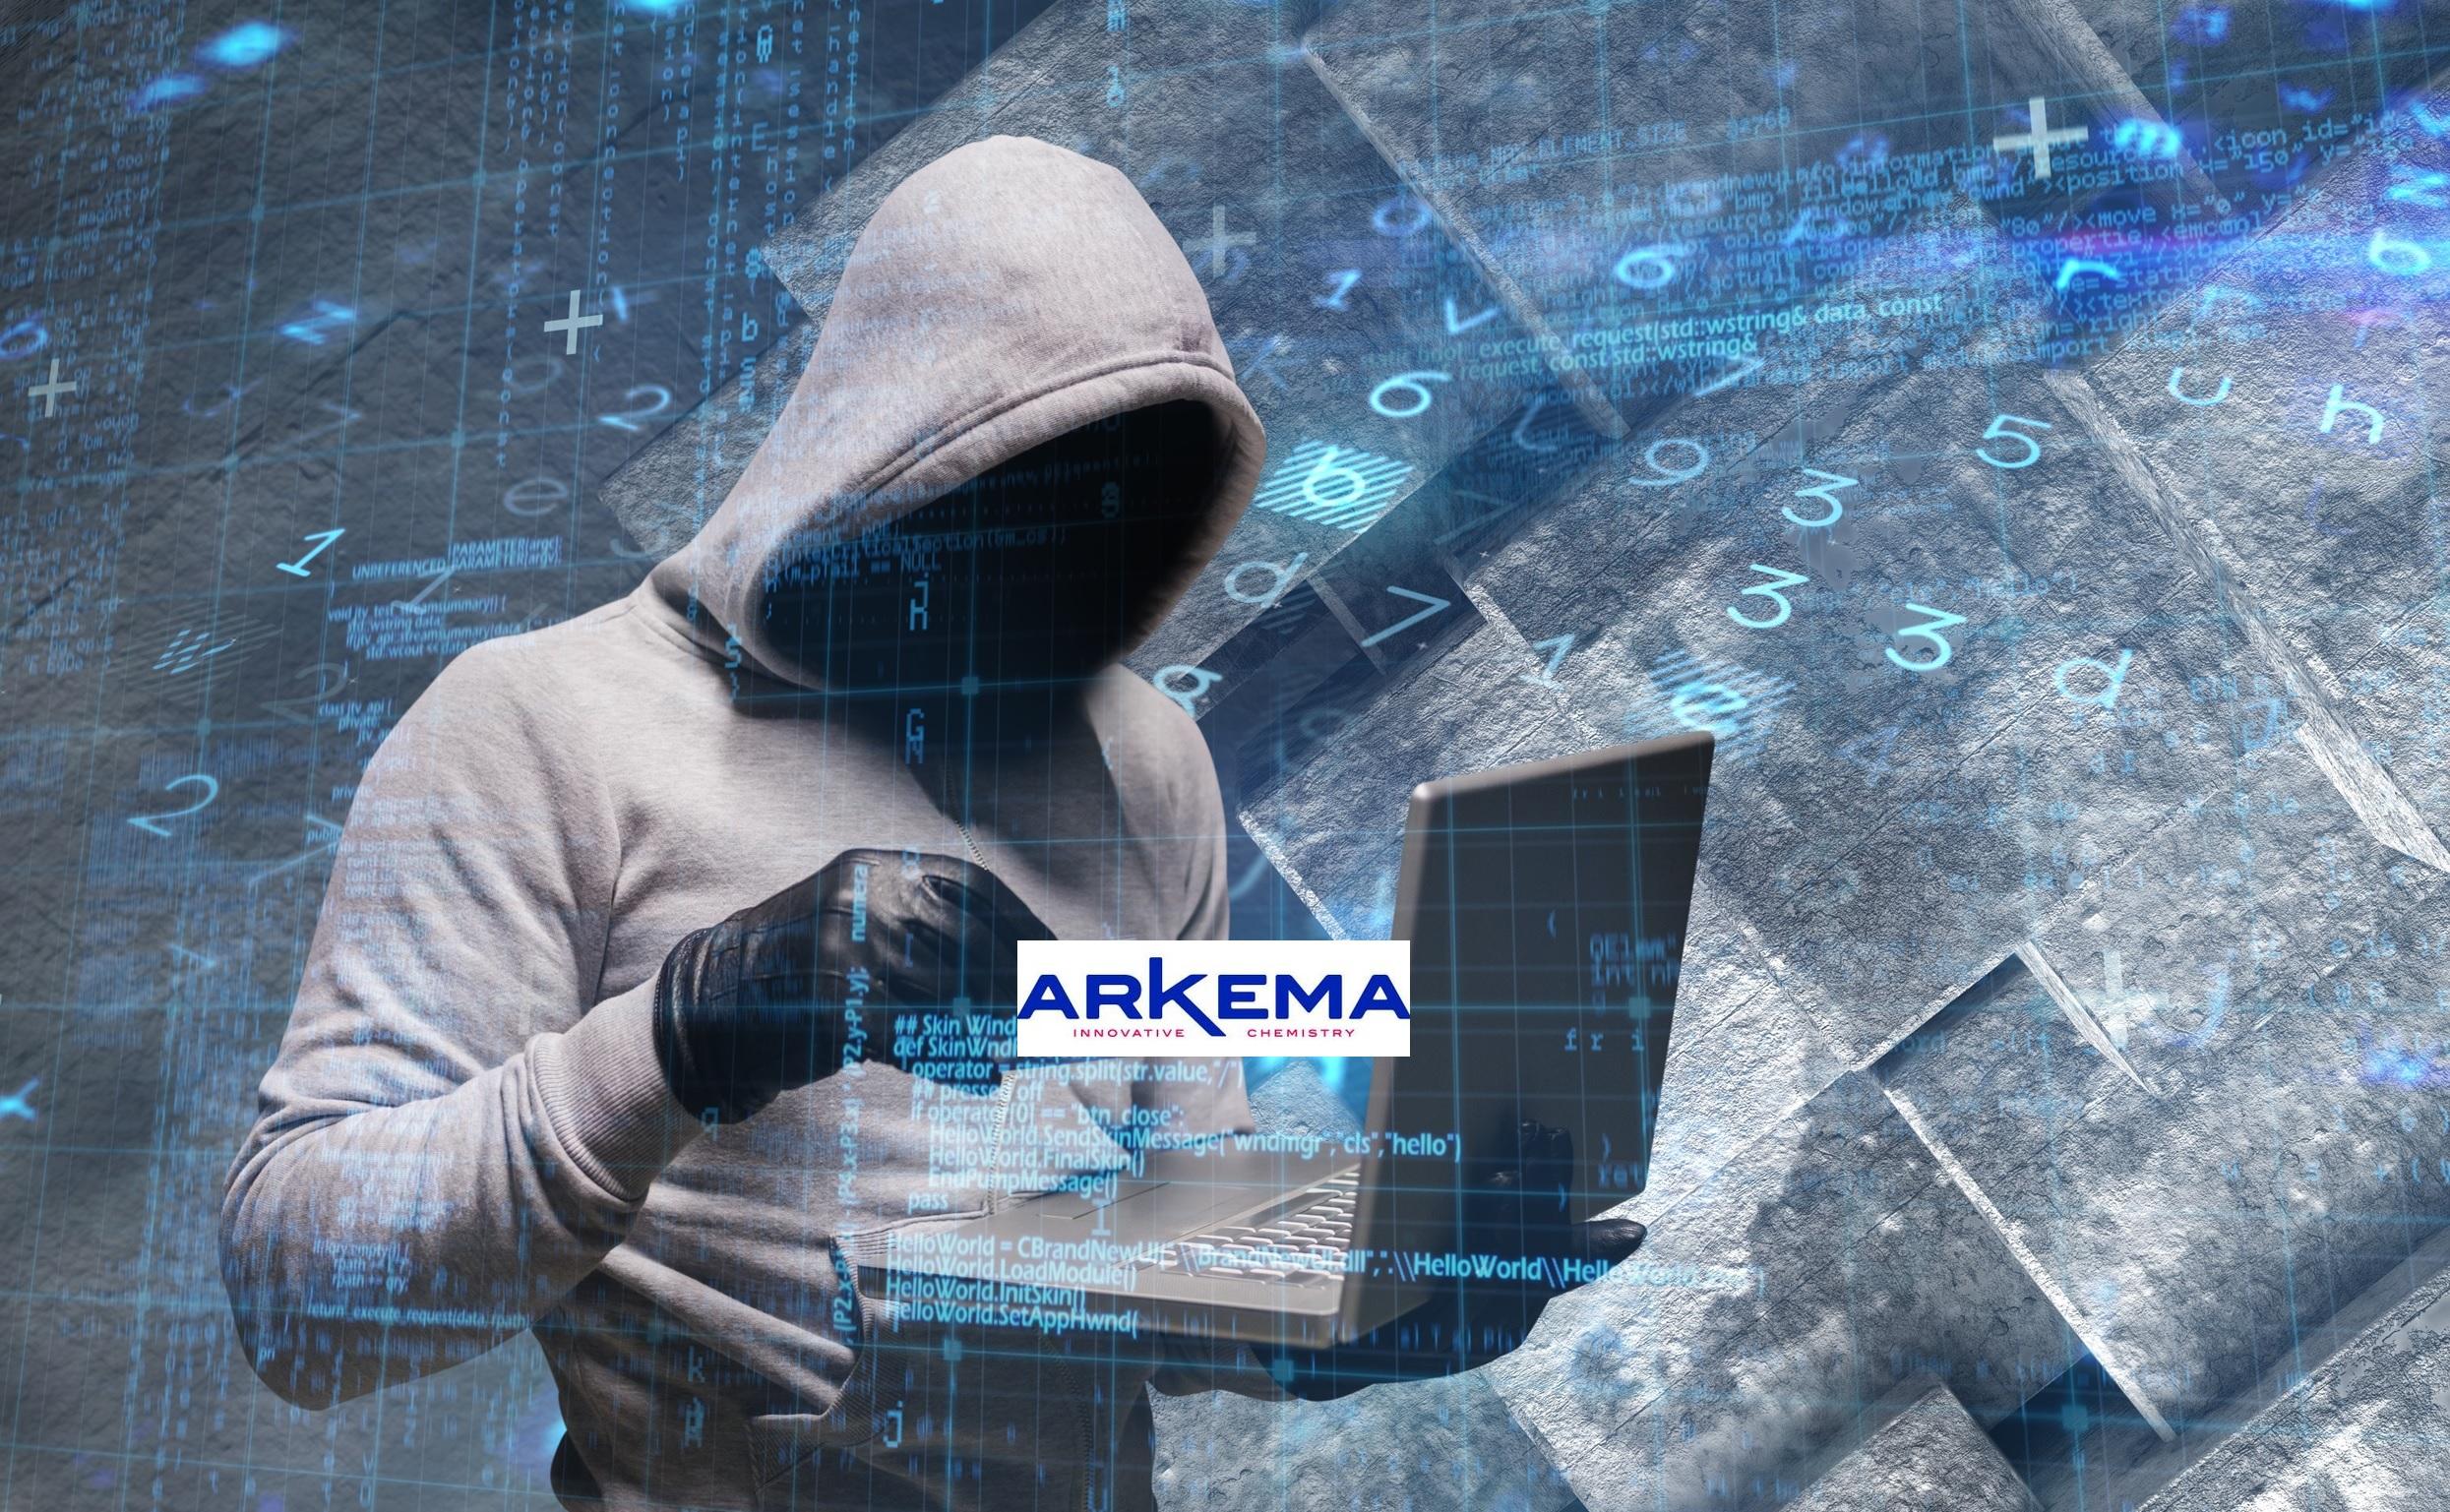 usurpation d'identité adresse email Arkema